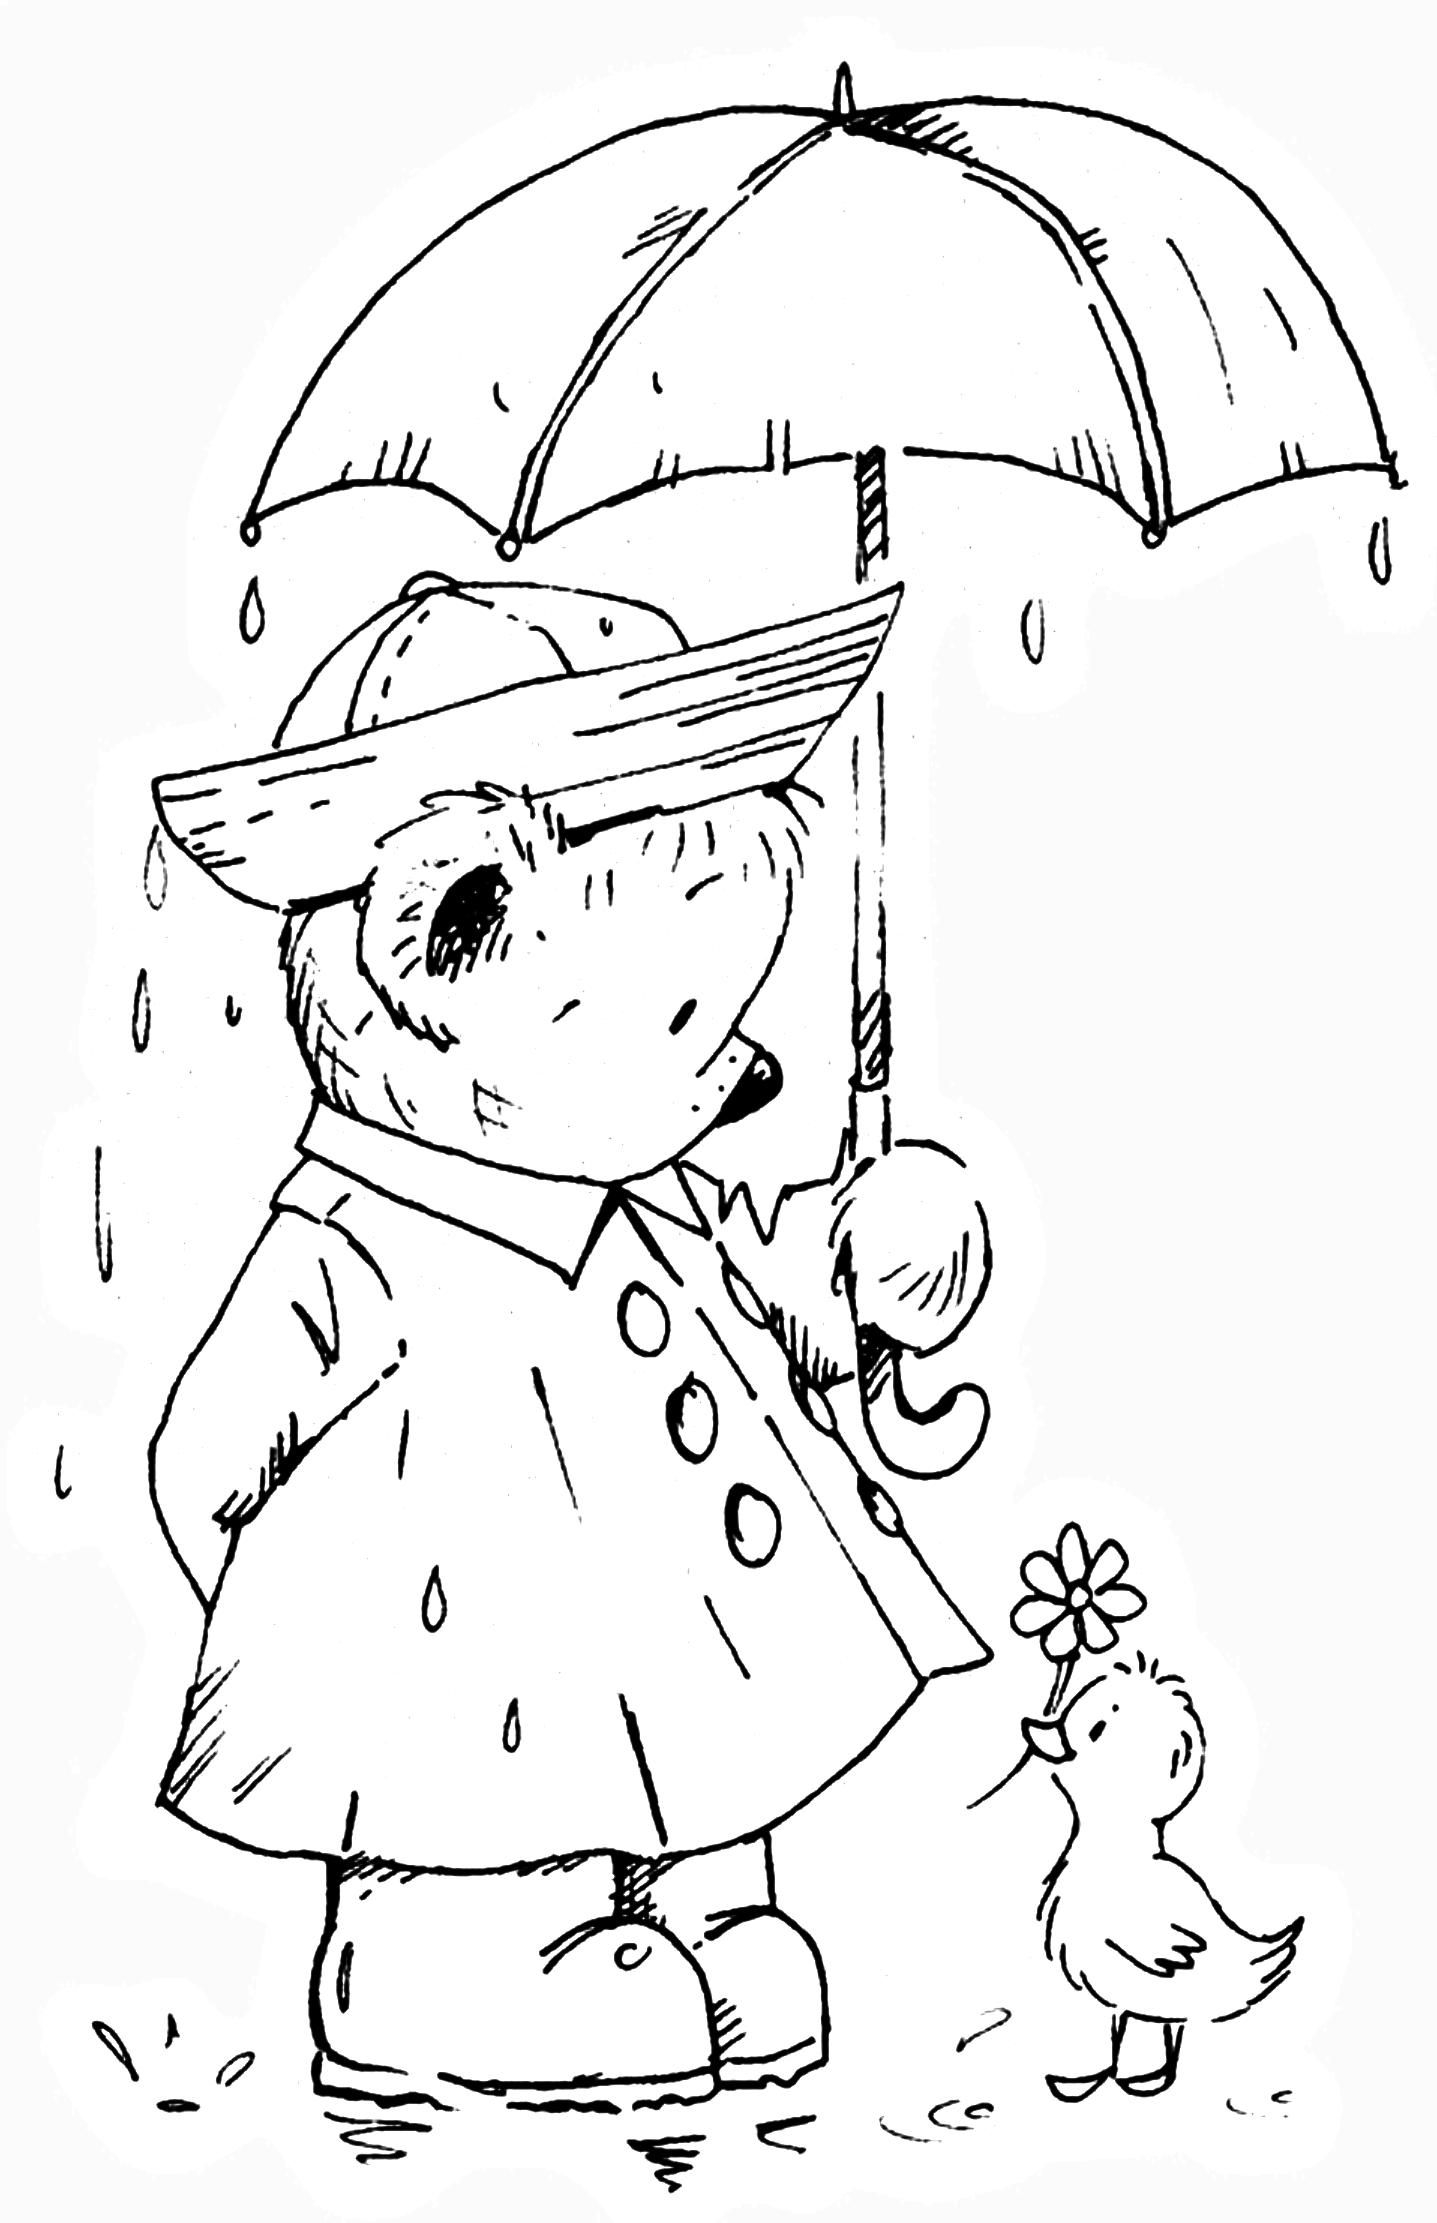 PB - Sunshine In The Rain | Images | Pinterest | Colorear, Dibujo y Osos